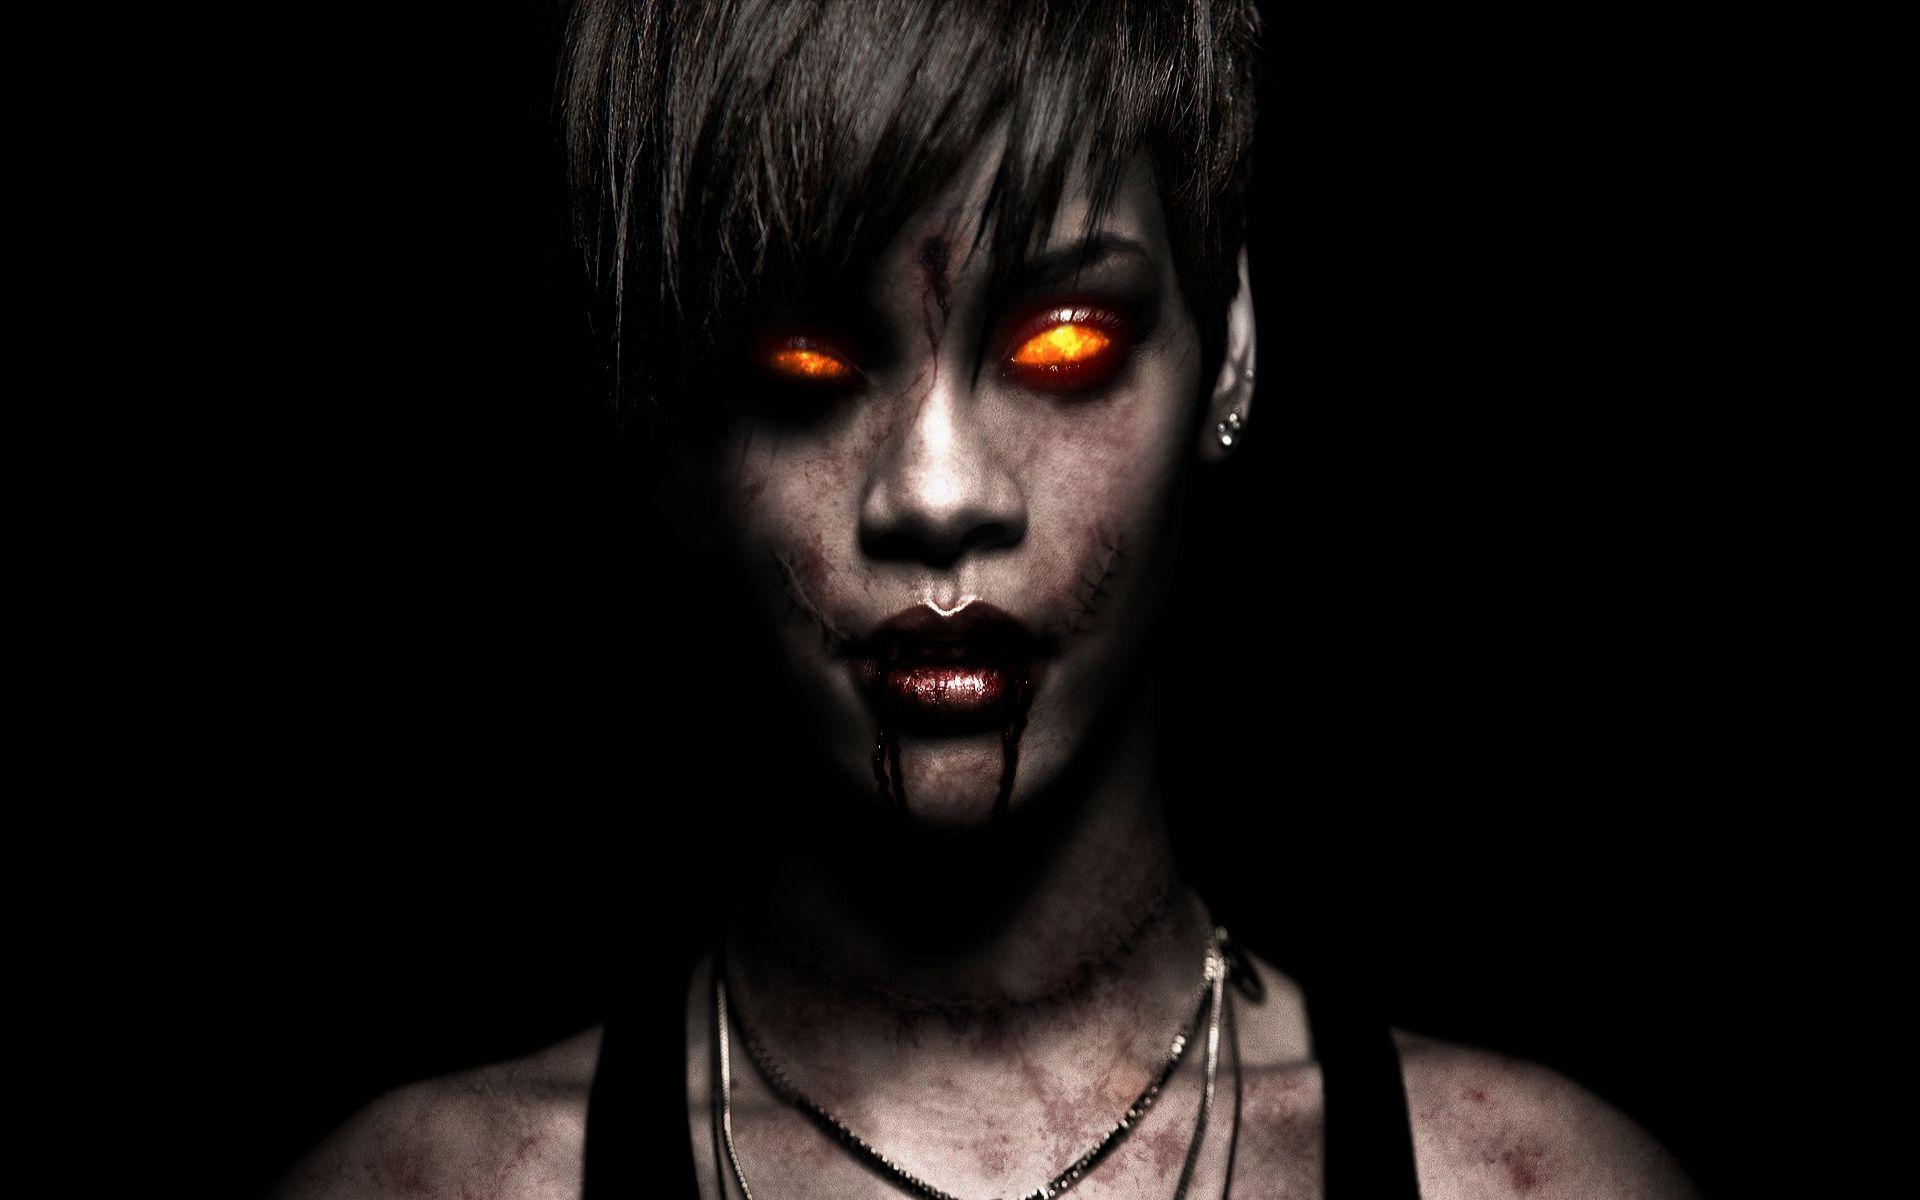 Beautiful Evil Evil Woman Hd Wallpapers Zombie Wallpaper